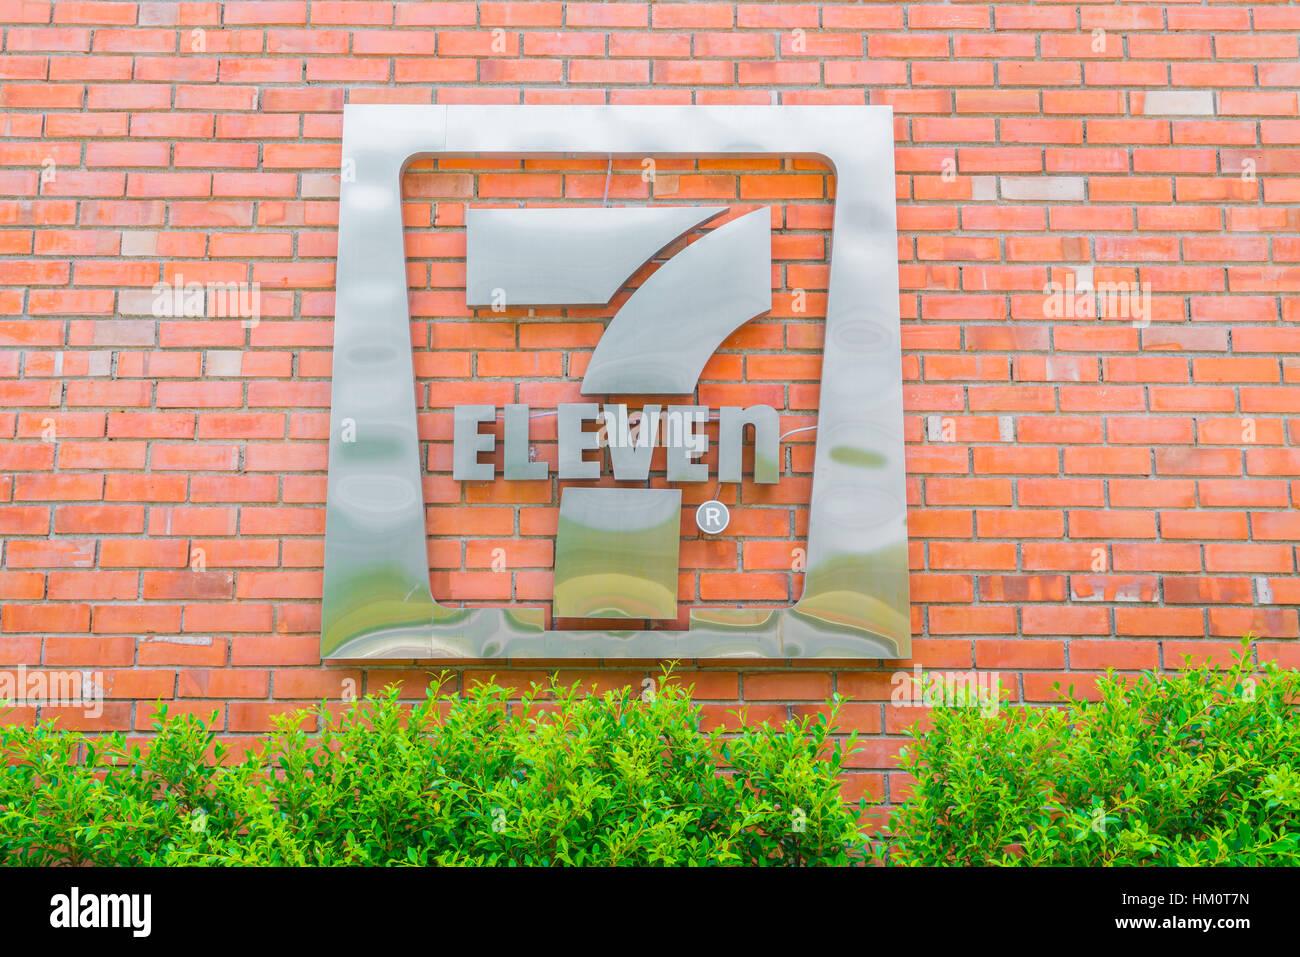 7 Eleven Logo Stock Photos Amp 7 Eleven Logo Stock Images